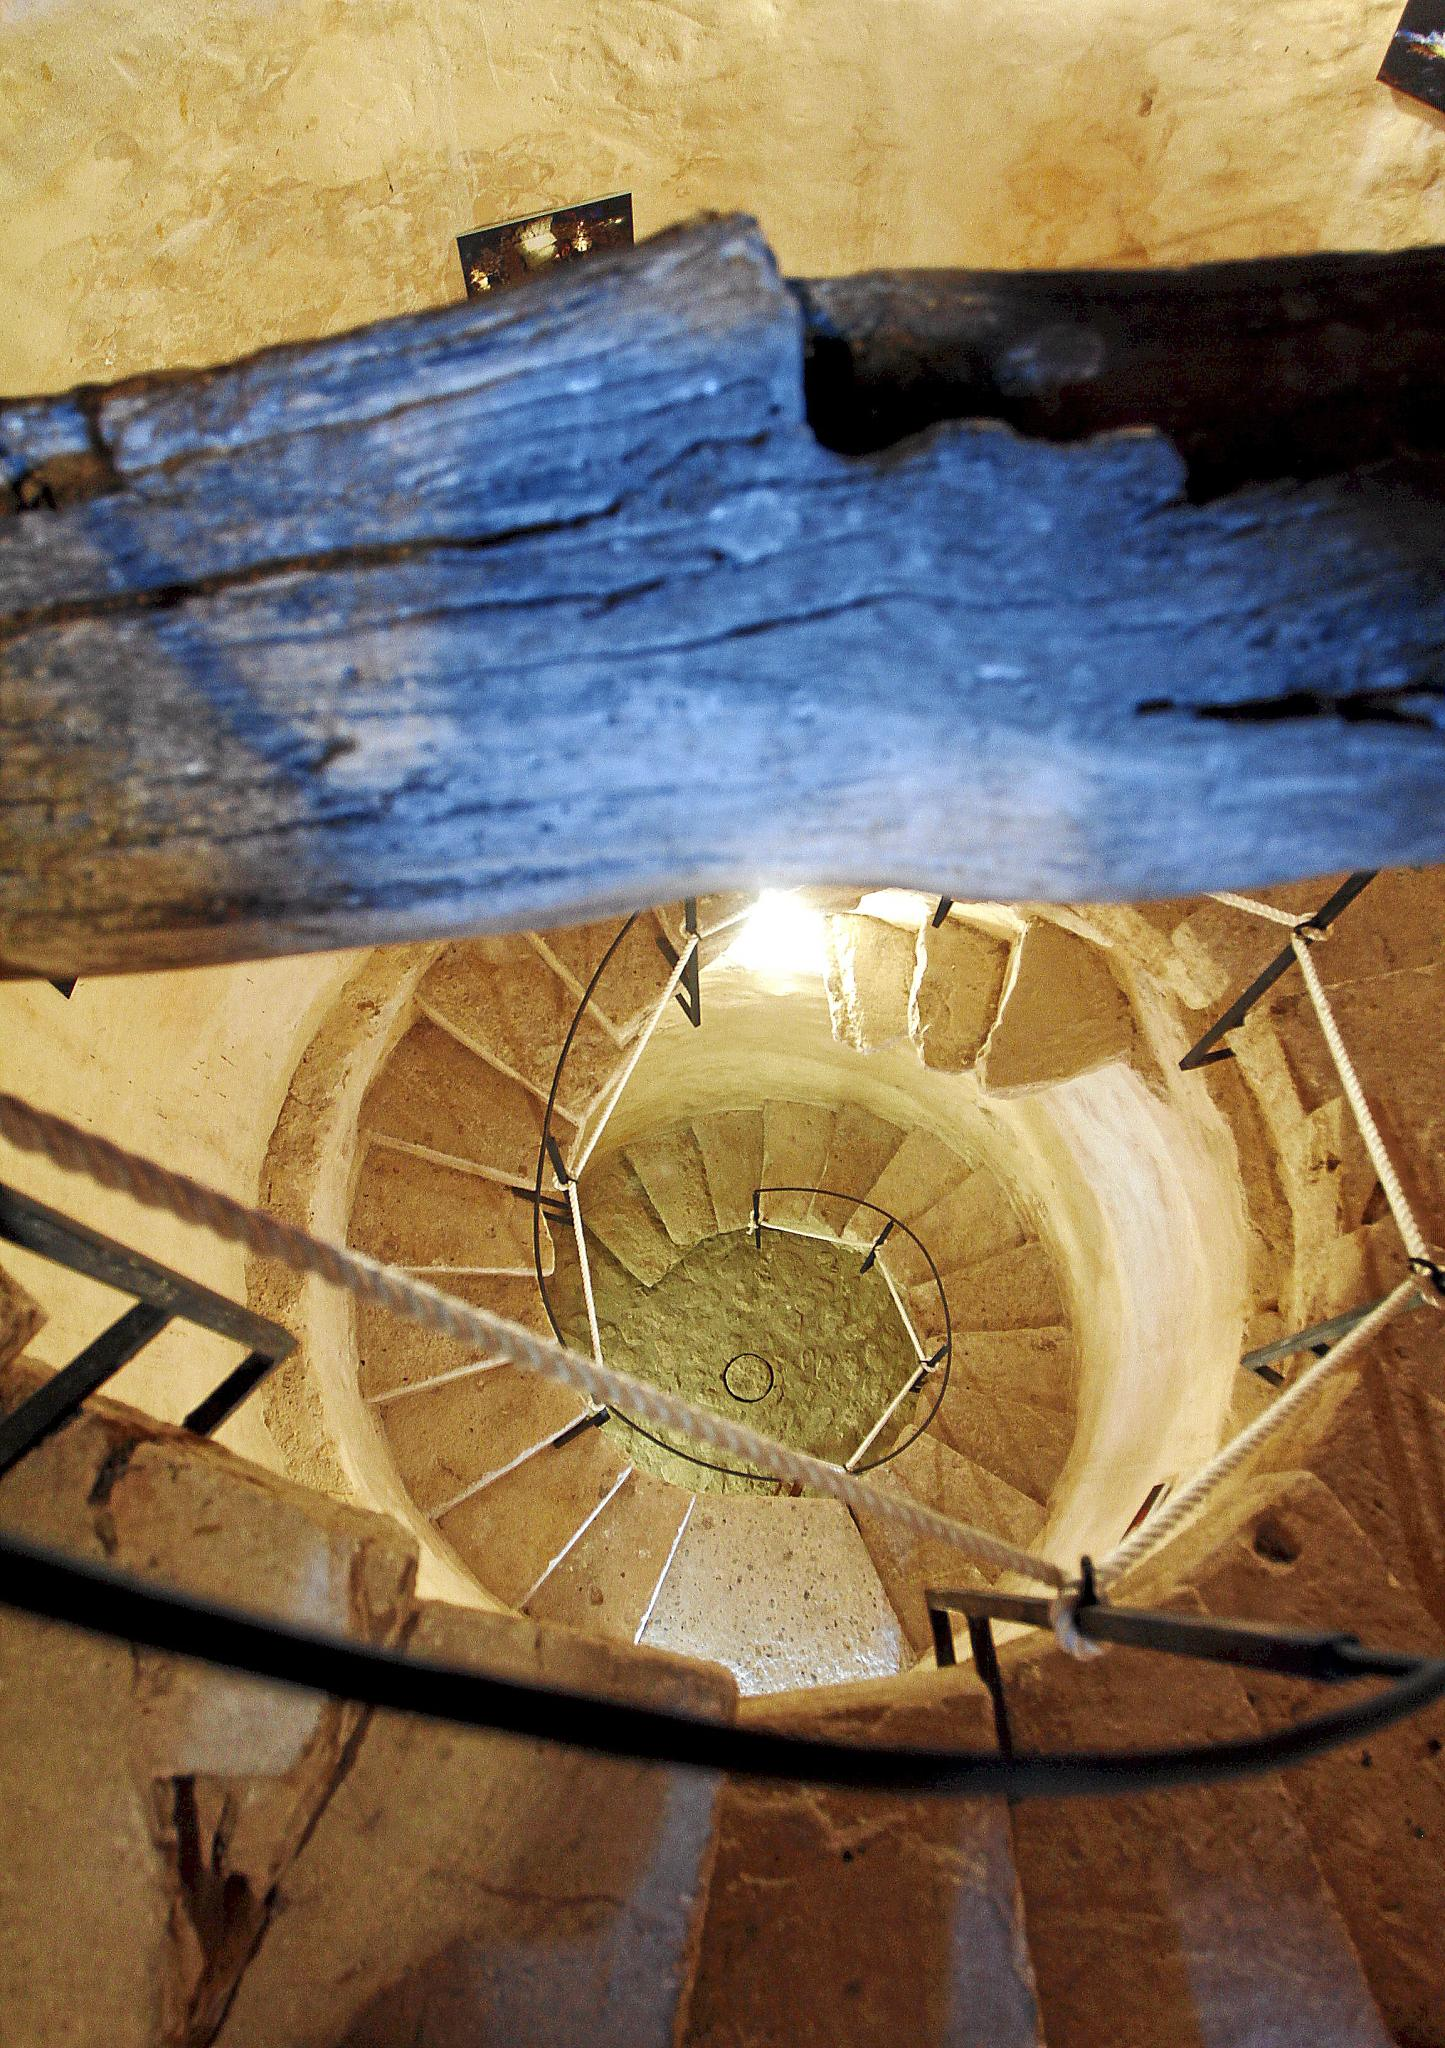 Son Fornés busca imponerse como centro dinamizador y punto de interés turístico